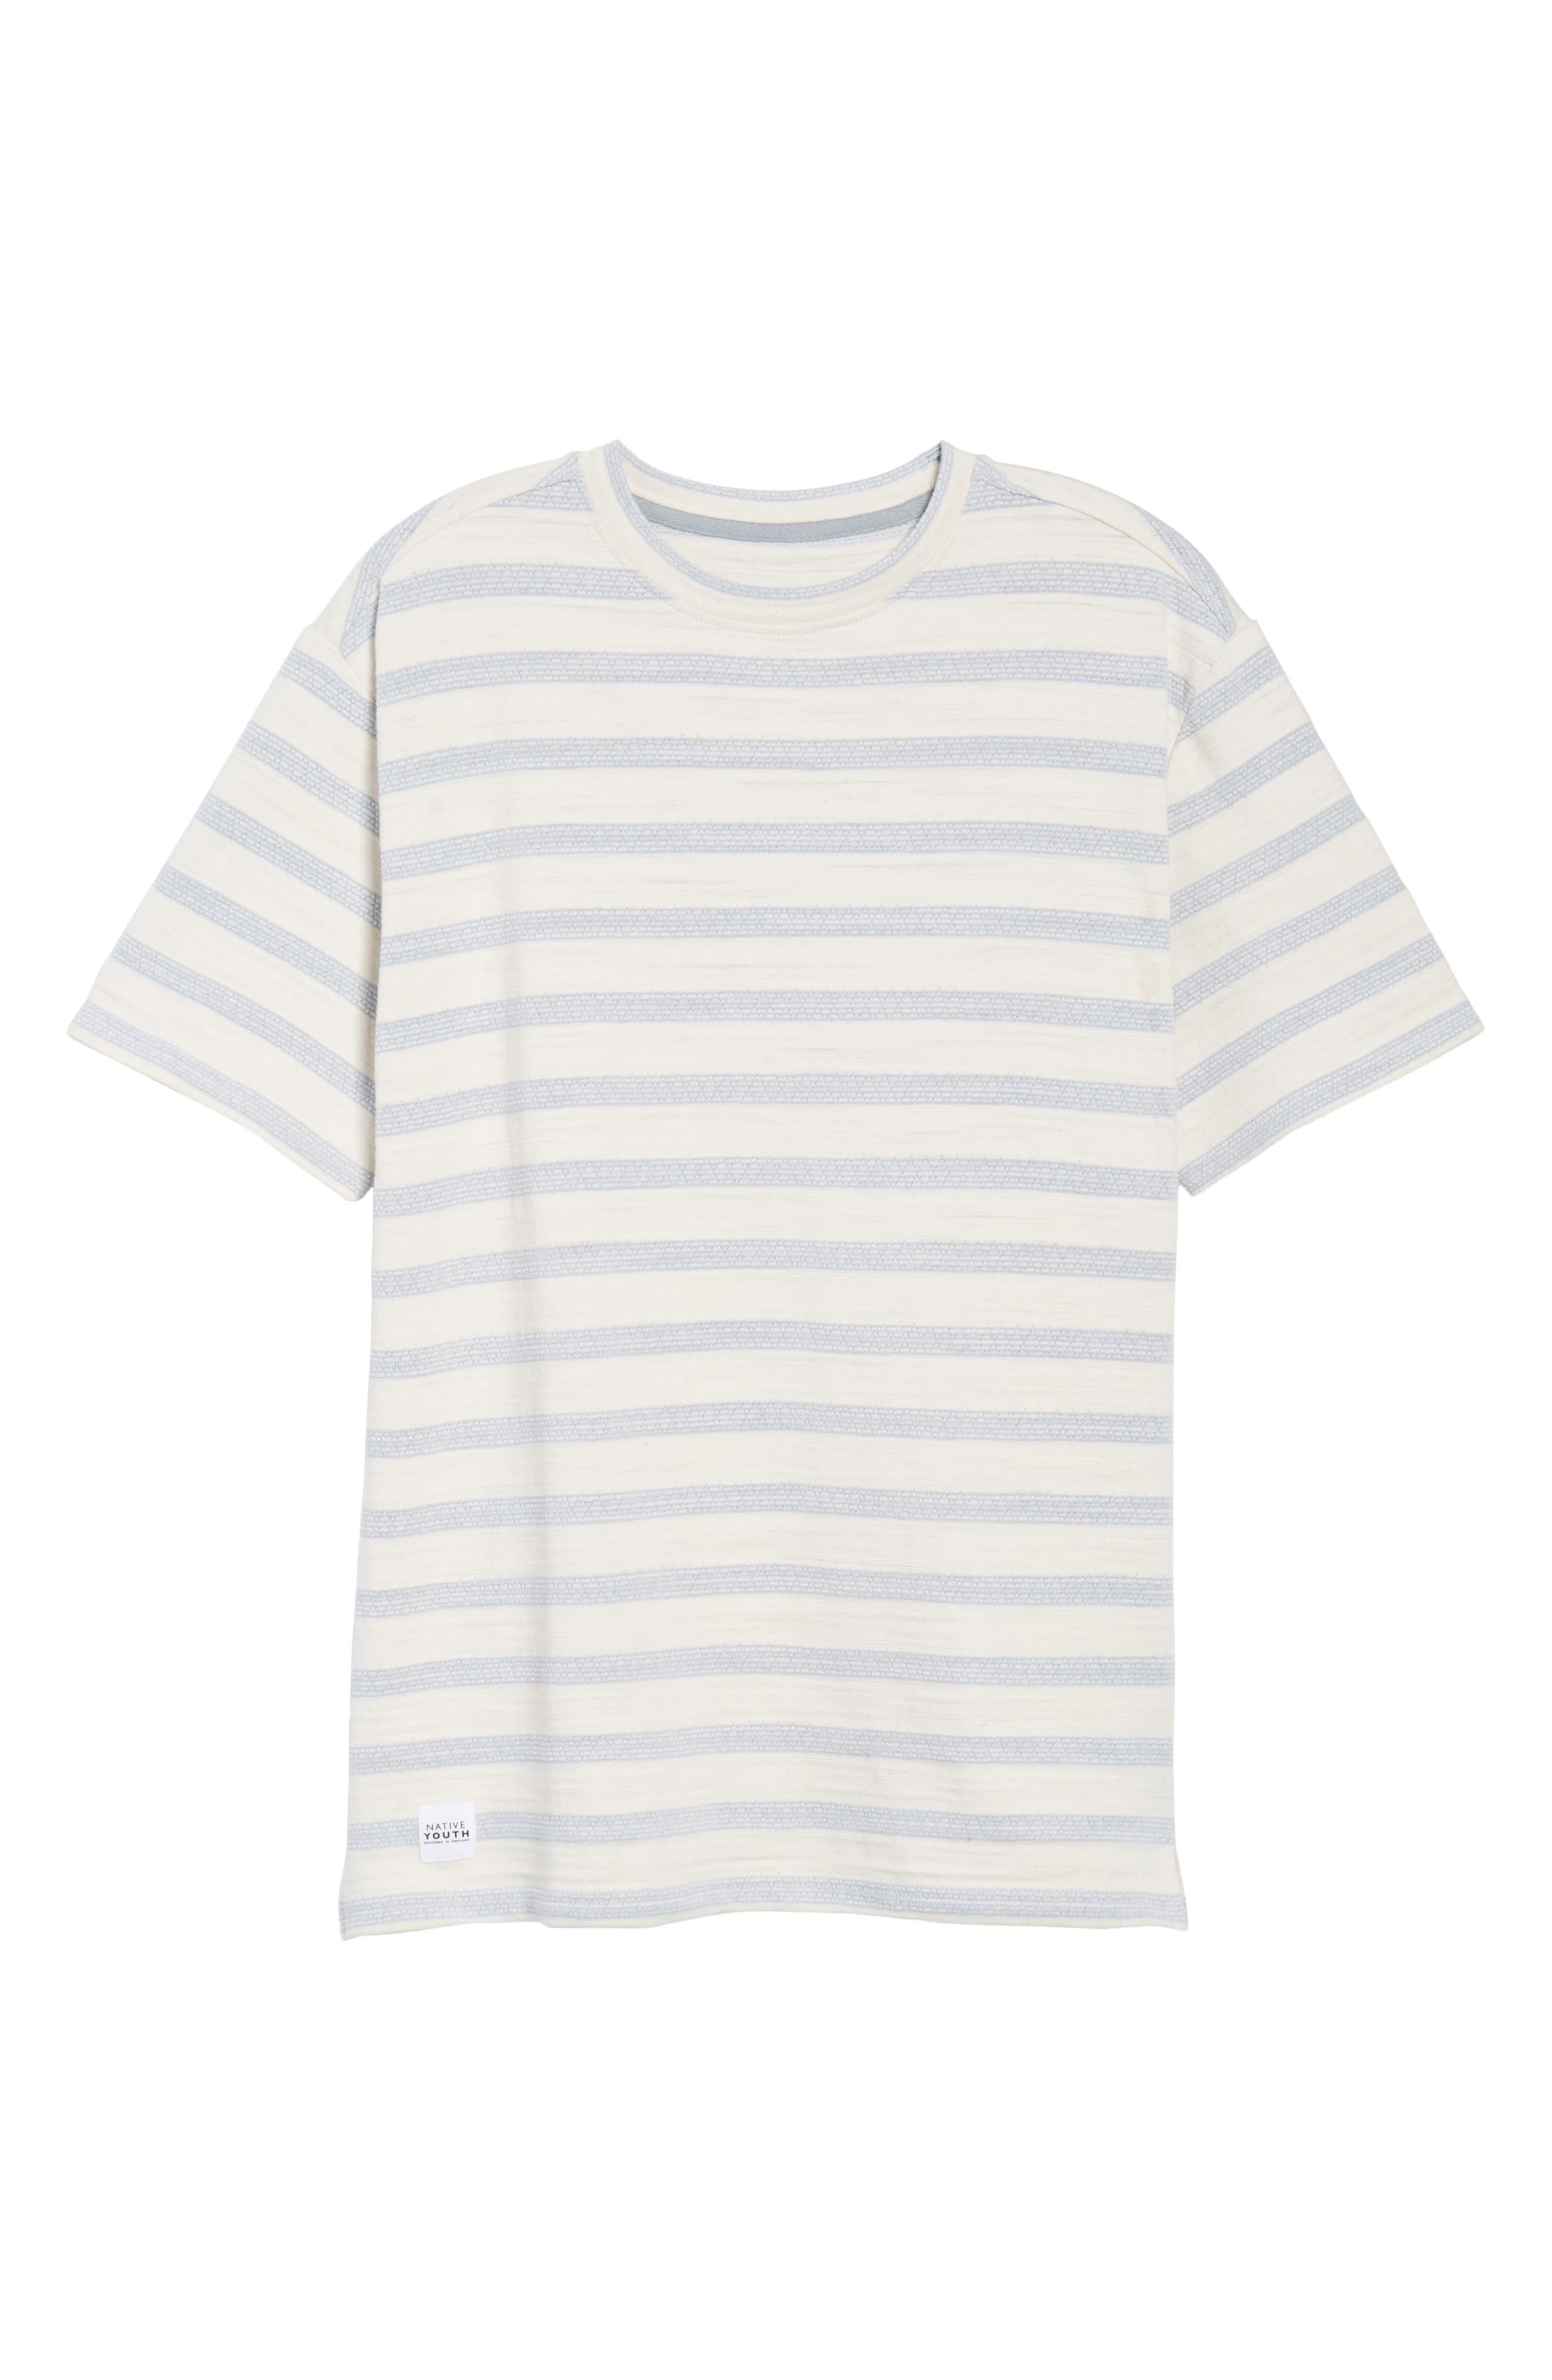 Waves T-Shirt,                             Alternate thumbnail 6, color,                             Off White